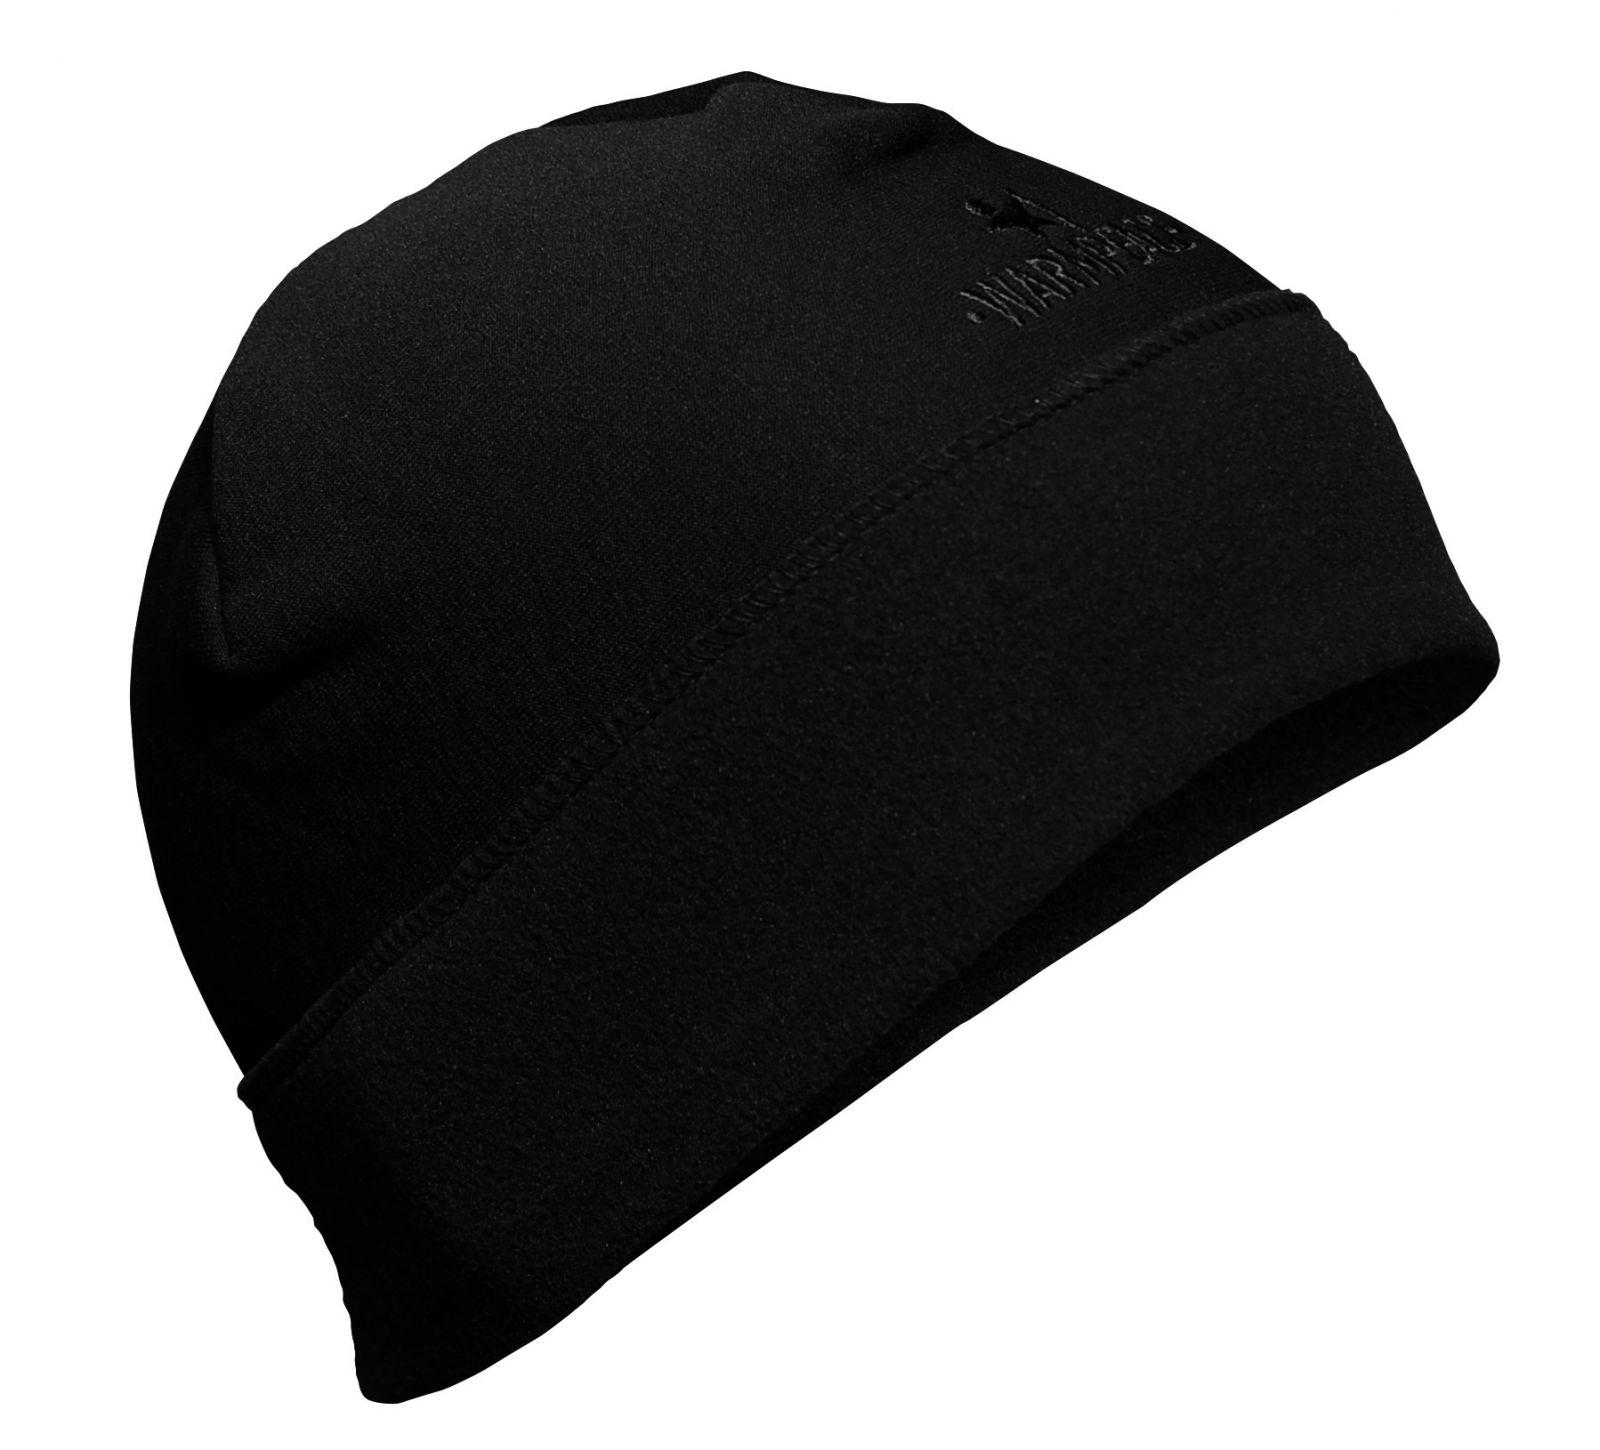 Tazz-Sport - Warmpeace Skip black čepice Polartec Powerstretch